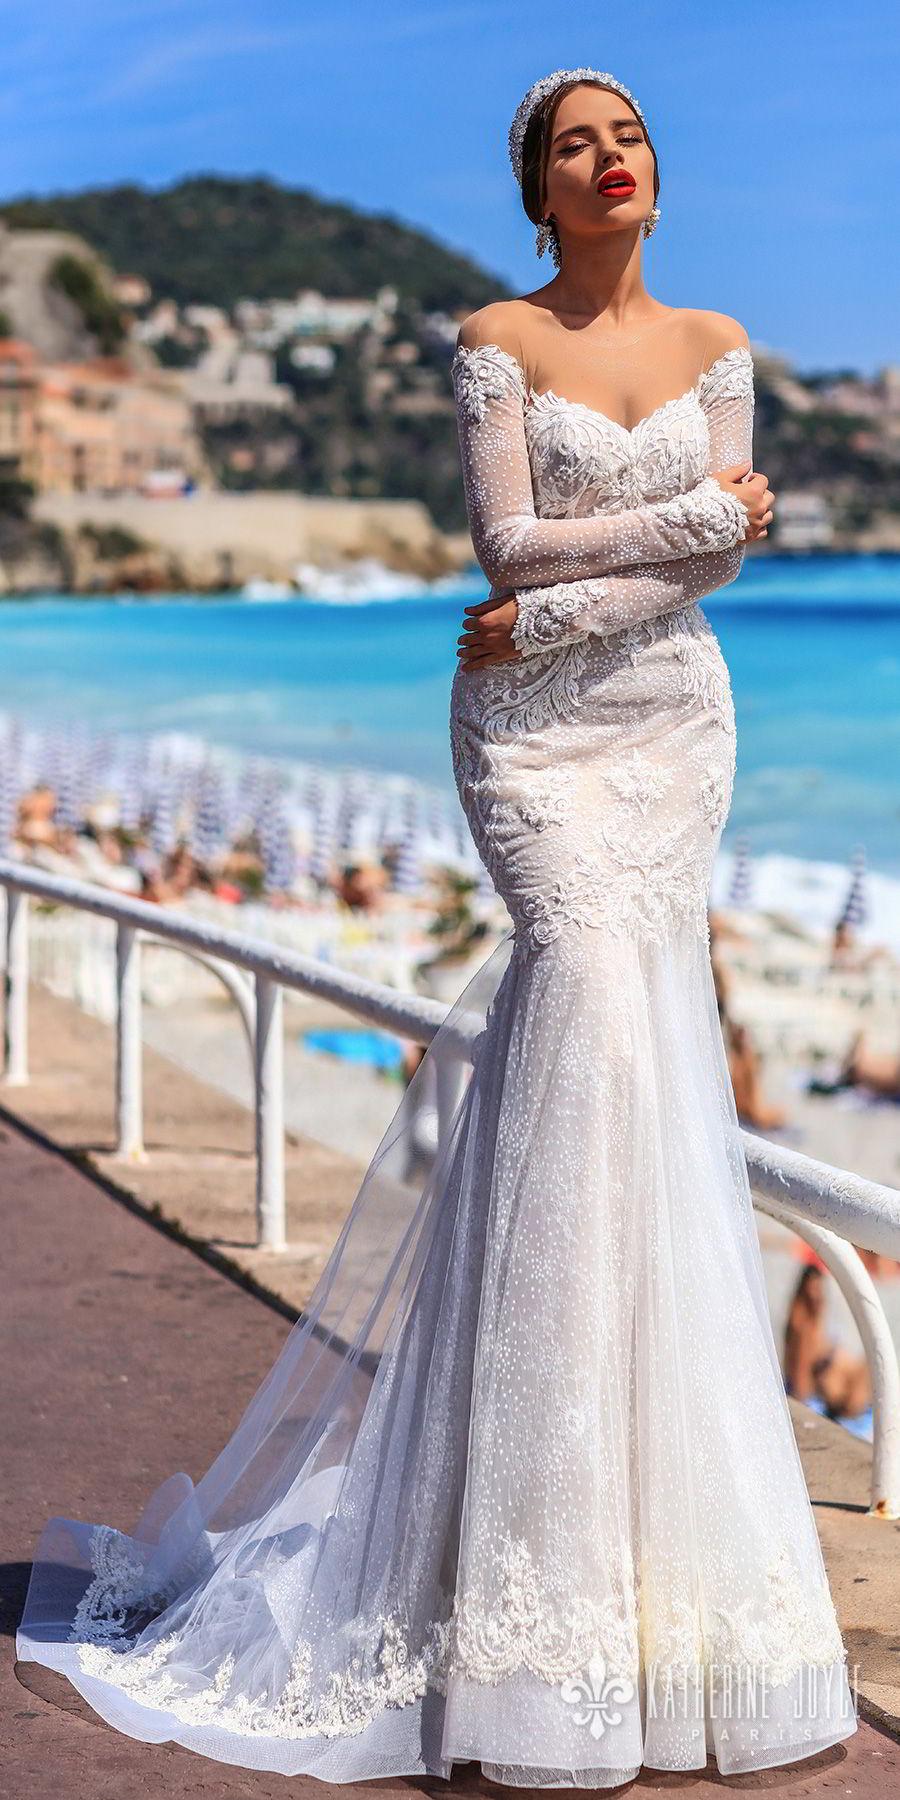 katherine joyce 2018 bridal long sleeves illusion jewel sweetheart neckline full embellishment elegant mermaid wedding dress keyhole back sweep train (valencia) mv